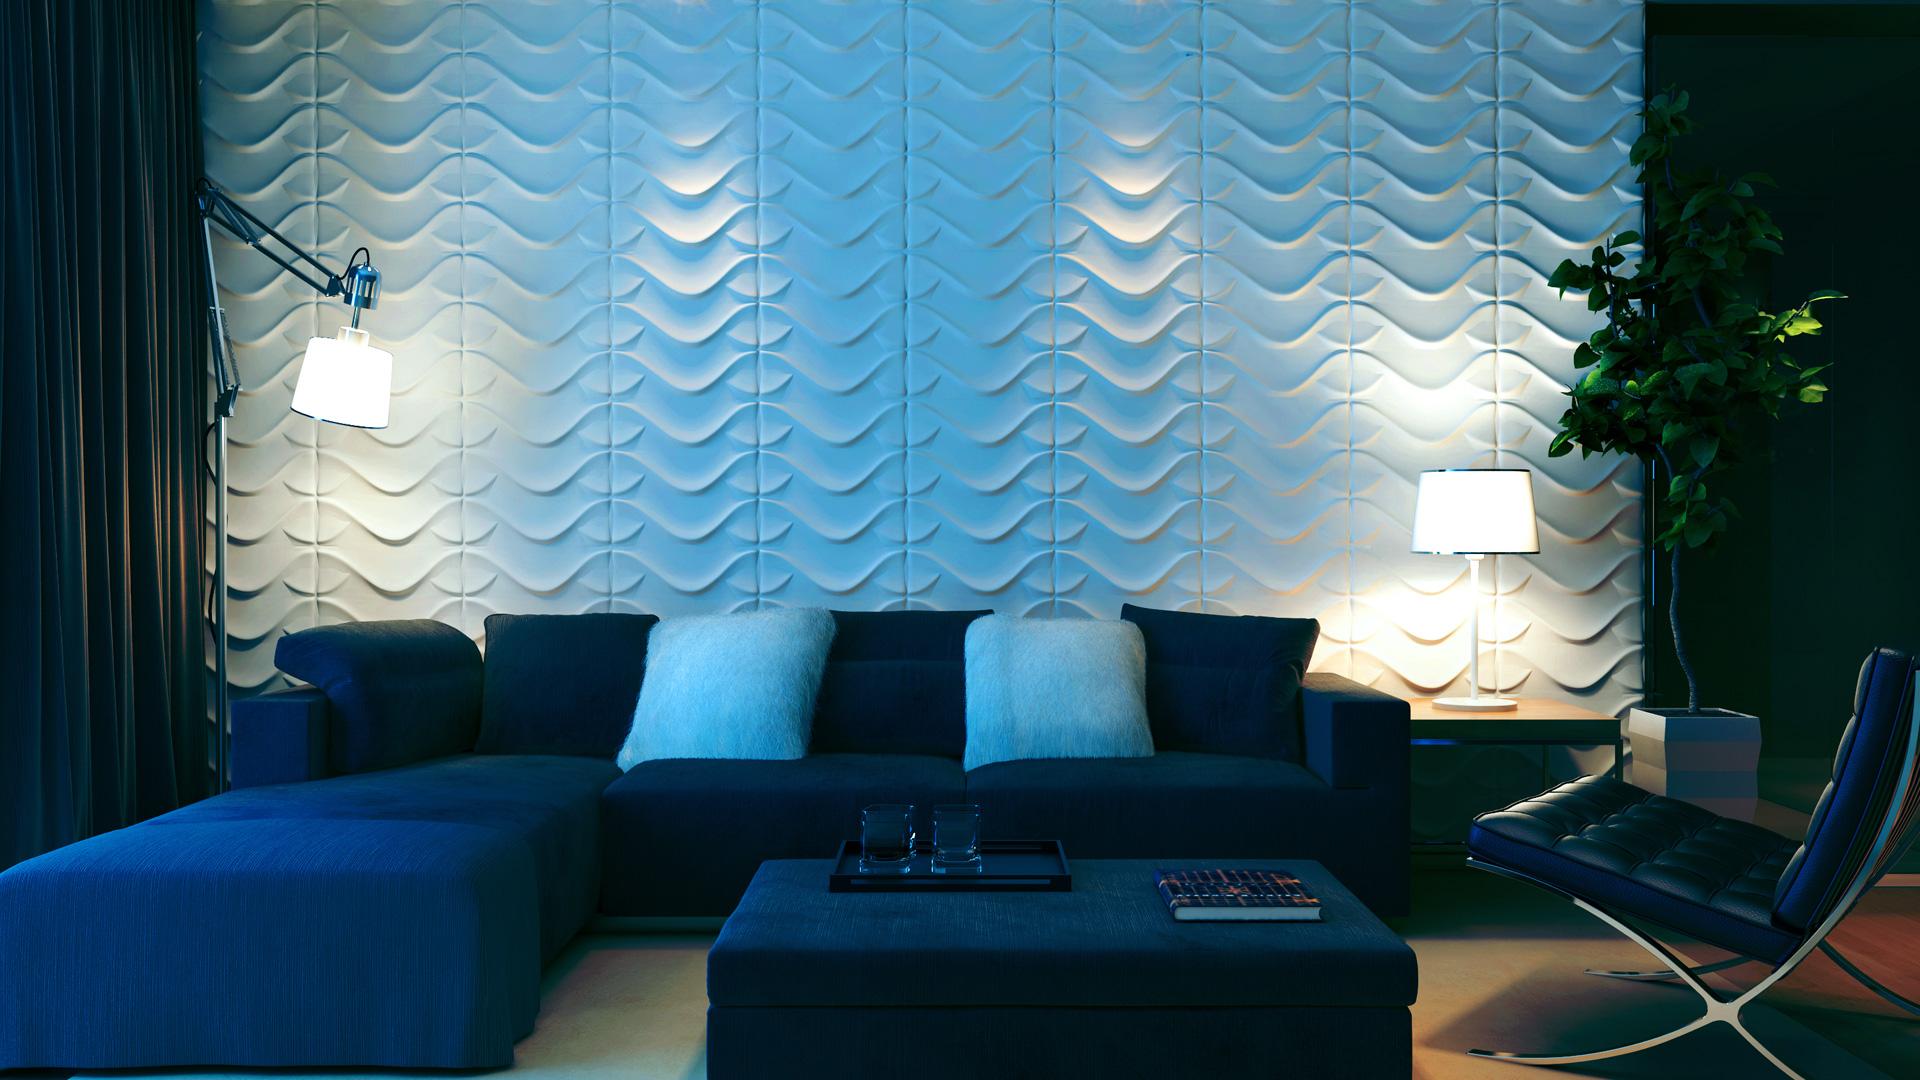 3D Wandpaneele - Produkte - Enric - Deckenpaneele - 3D Tapeten - Wandverkleidung